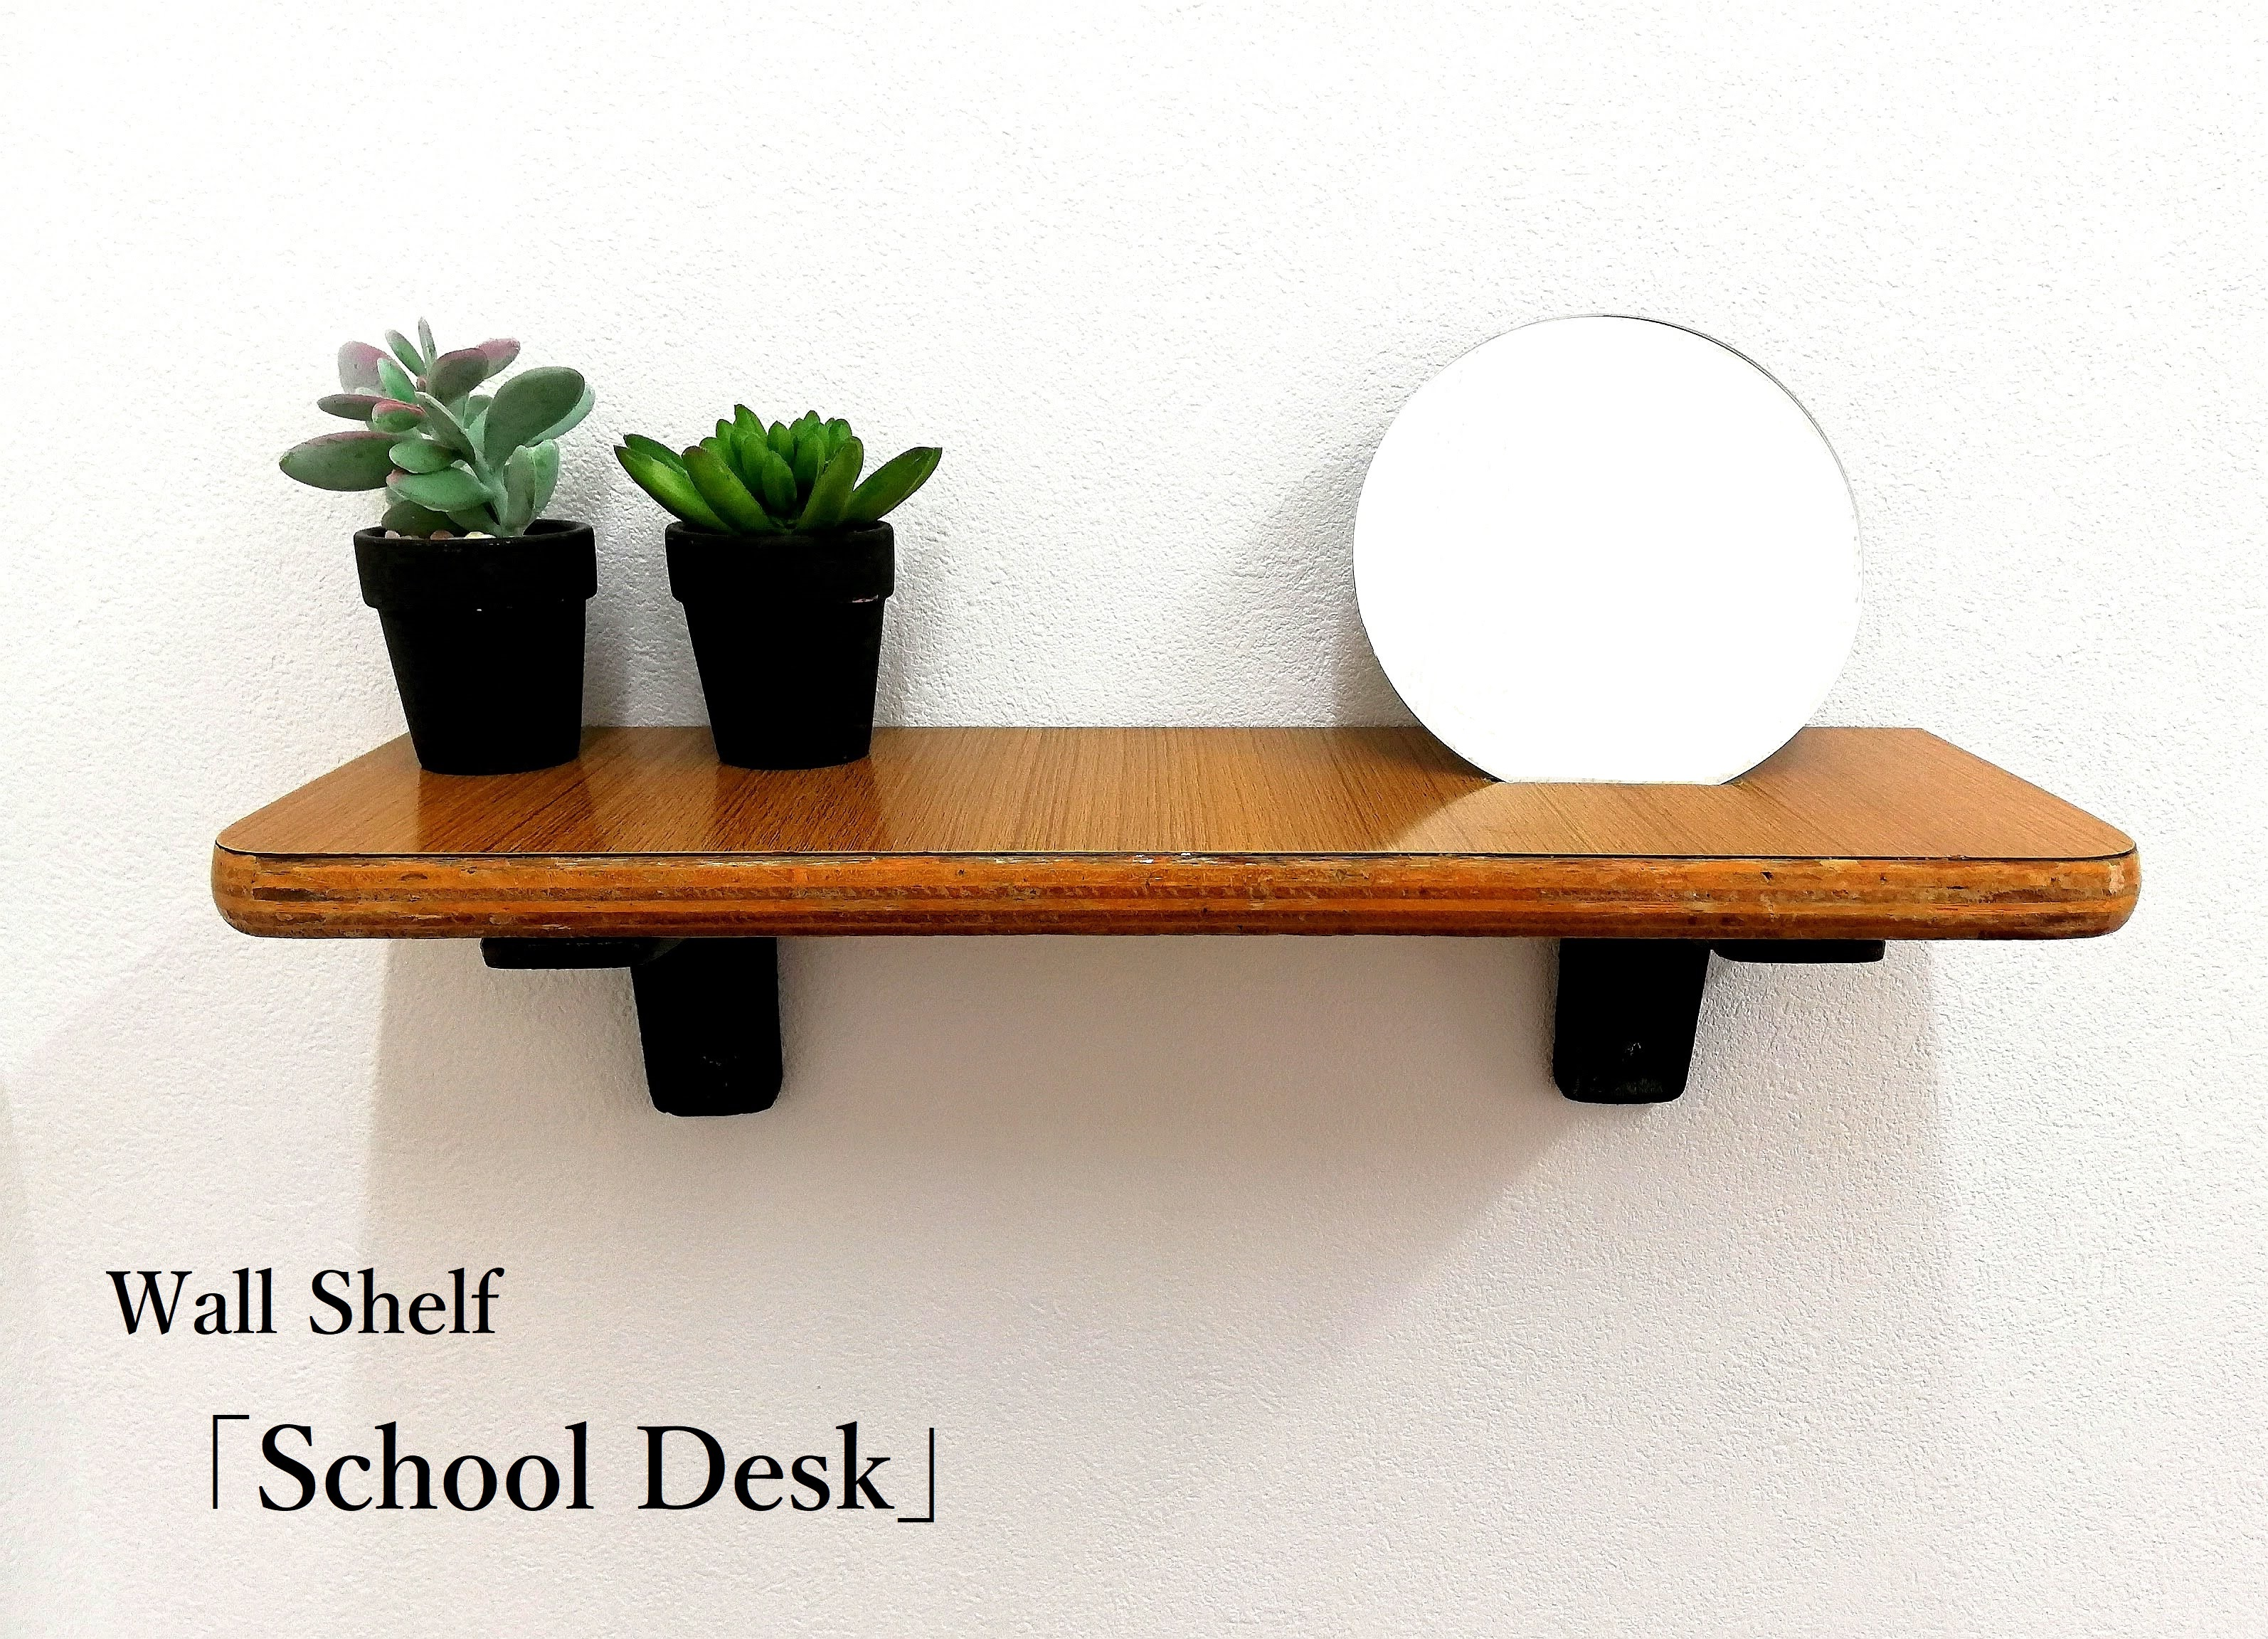 Wall Shelf「School Desk」(ミラー付属)